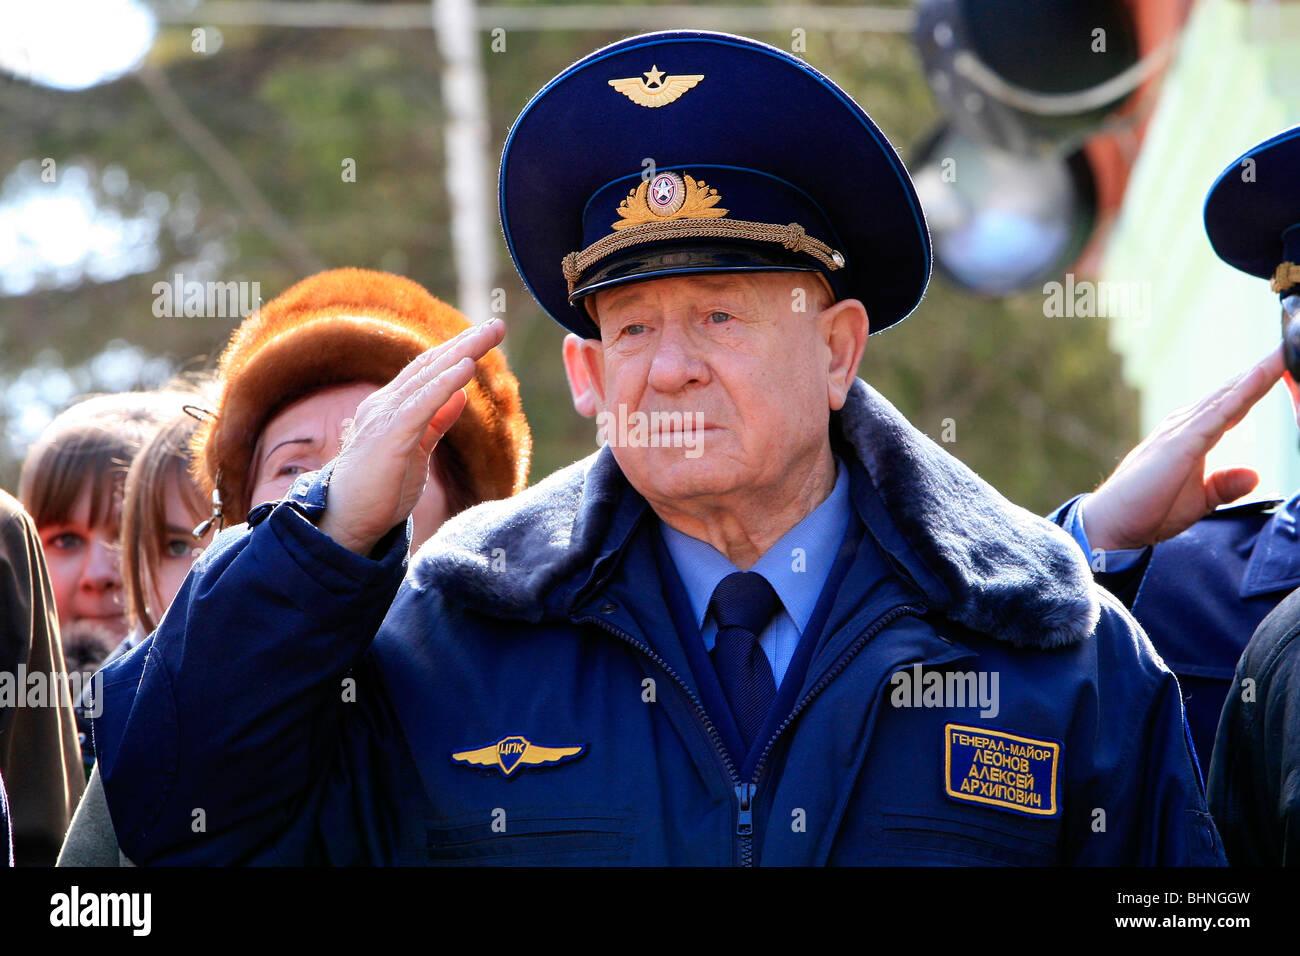 Soviet/Russian cosmonaut Alexey Leonov saluting whilst